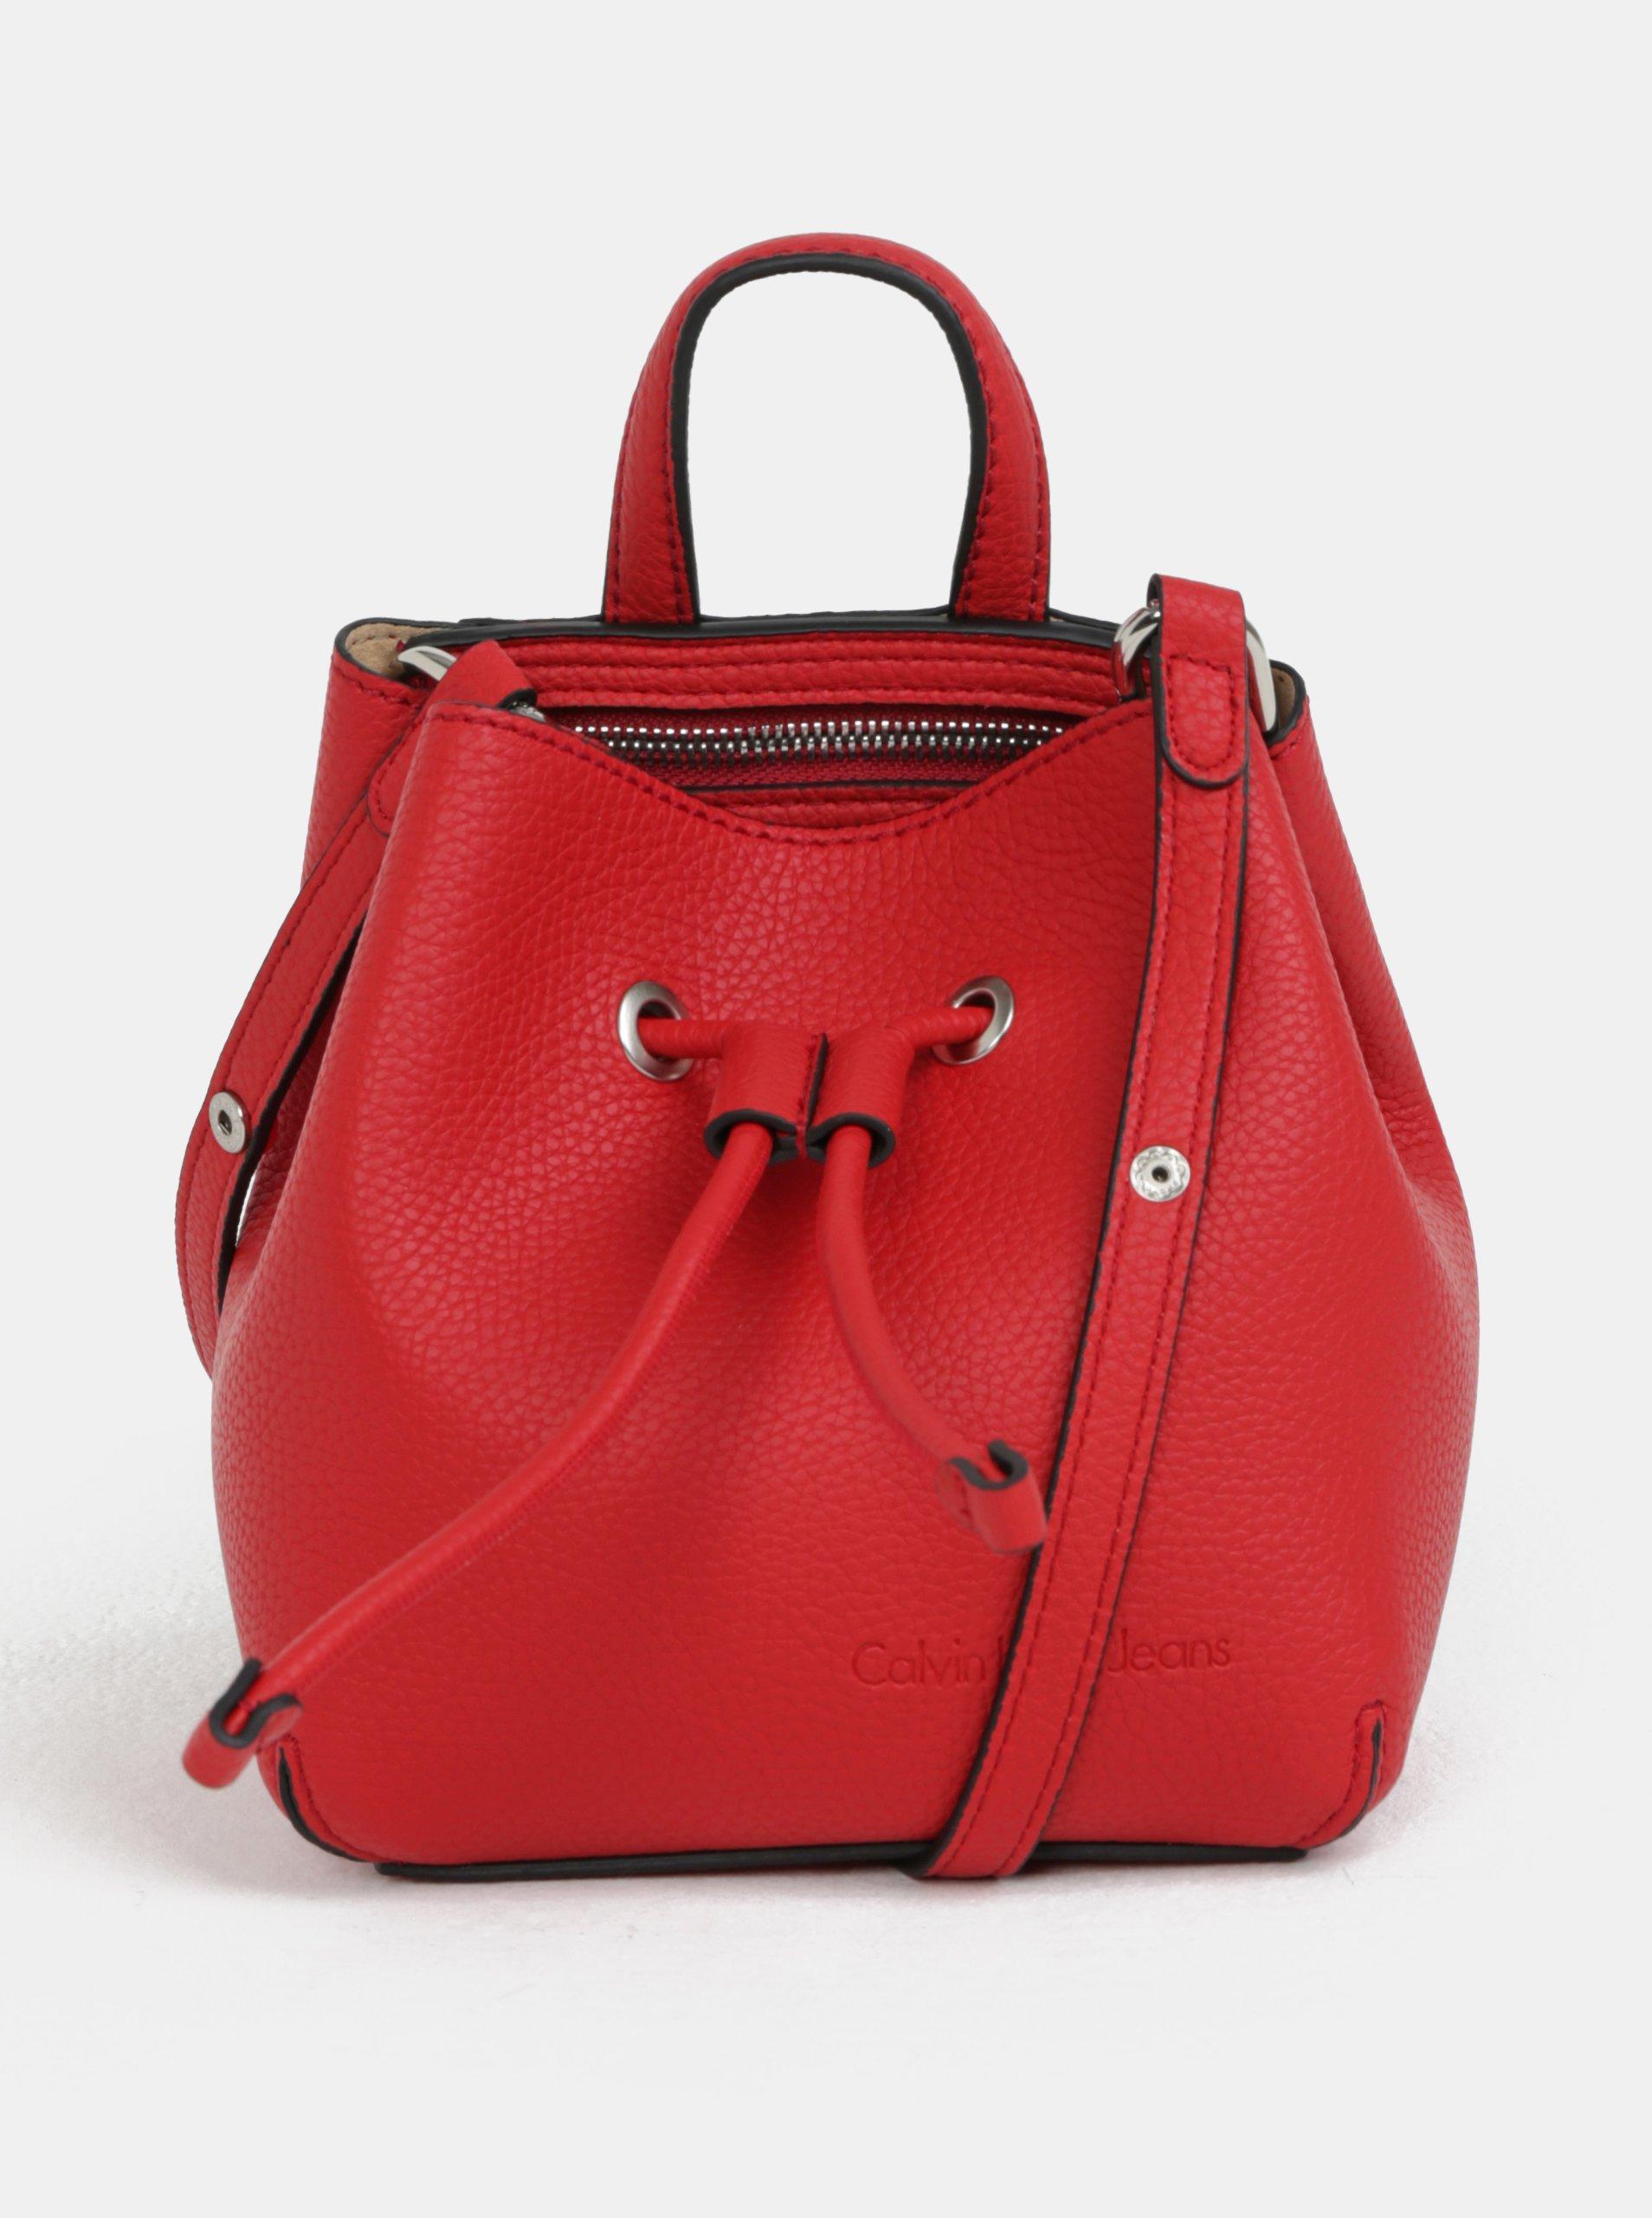 c0523a6fd3 Červená malá koženková vaková kabelka Calvin Klein Jeans